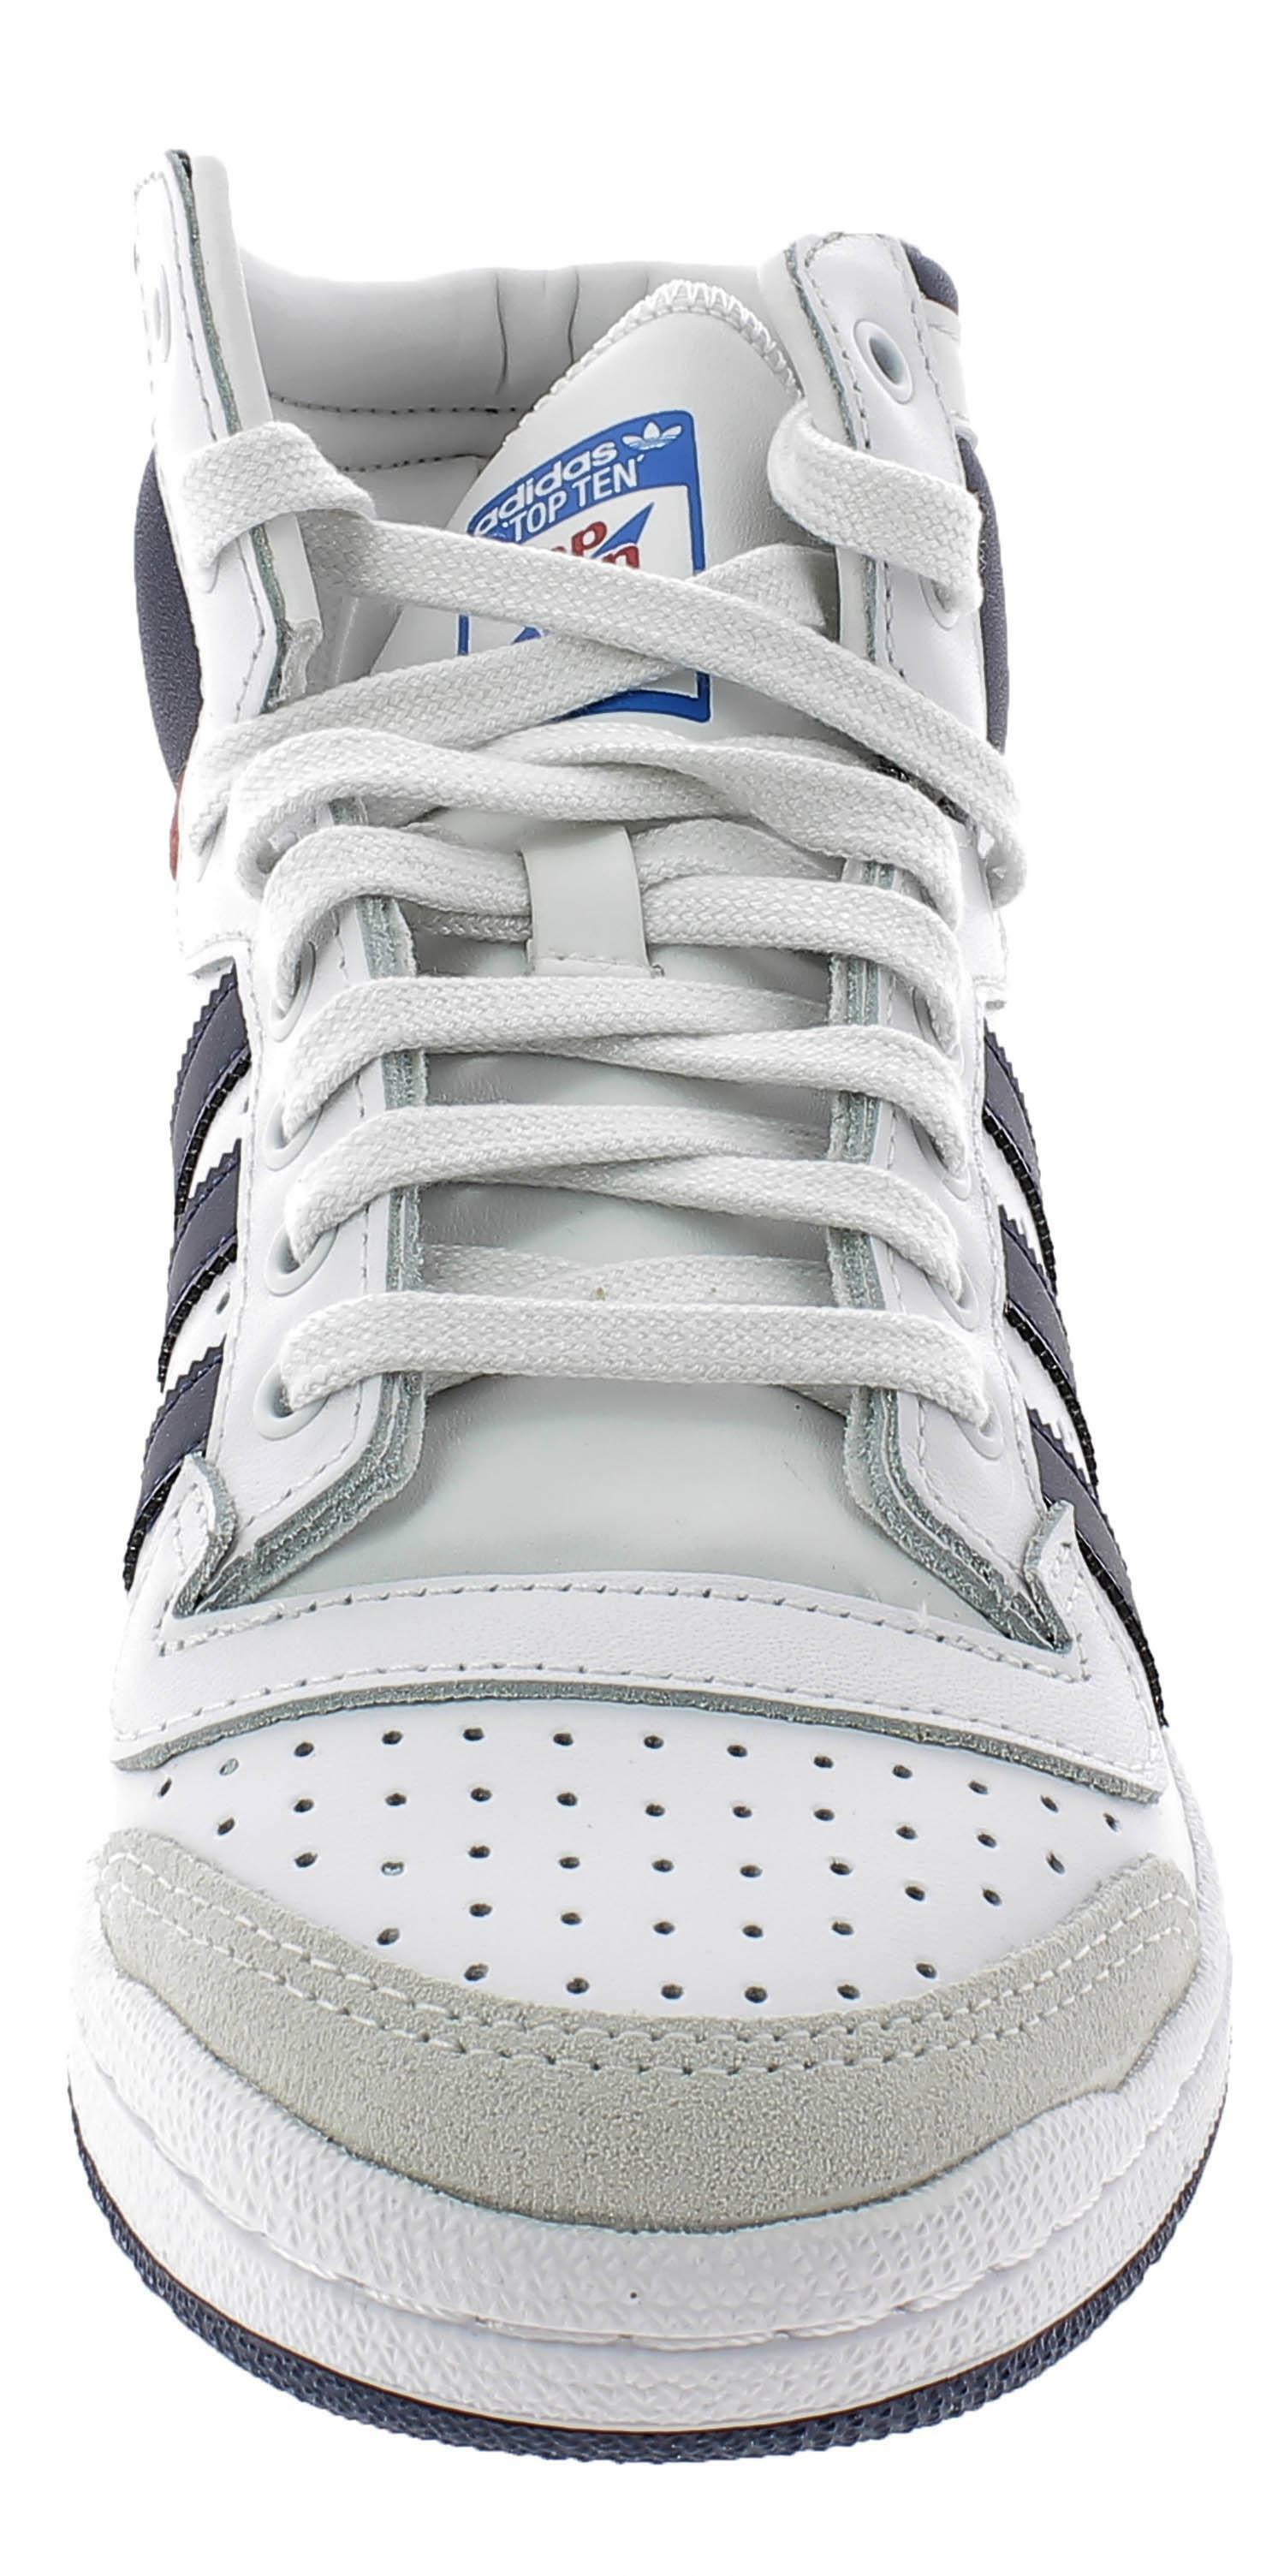 Adidas top ten hi scarpe sportive uomo bianche d65161